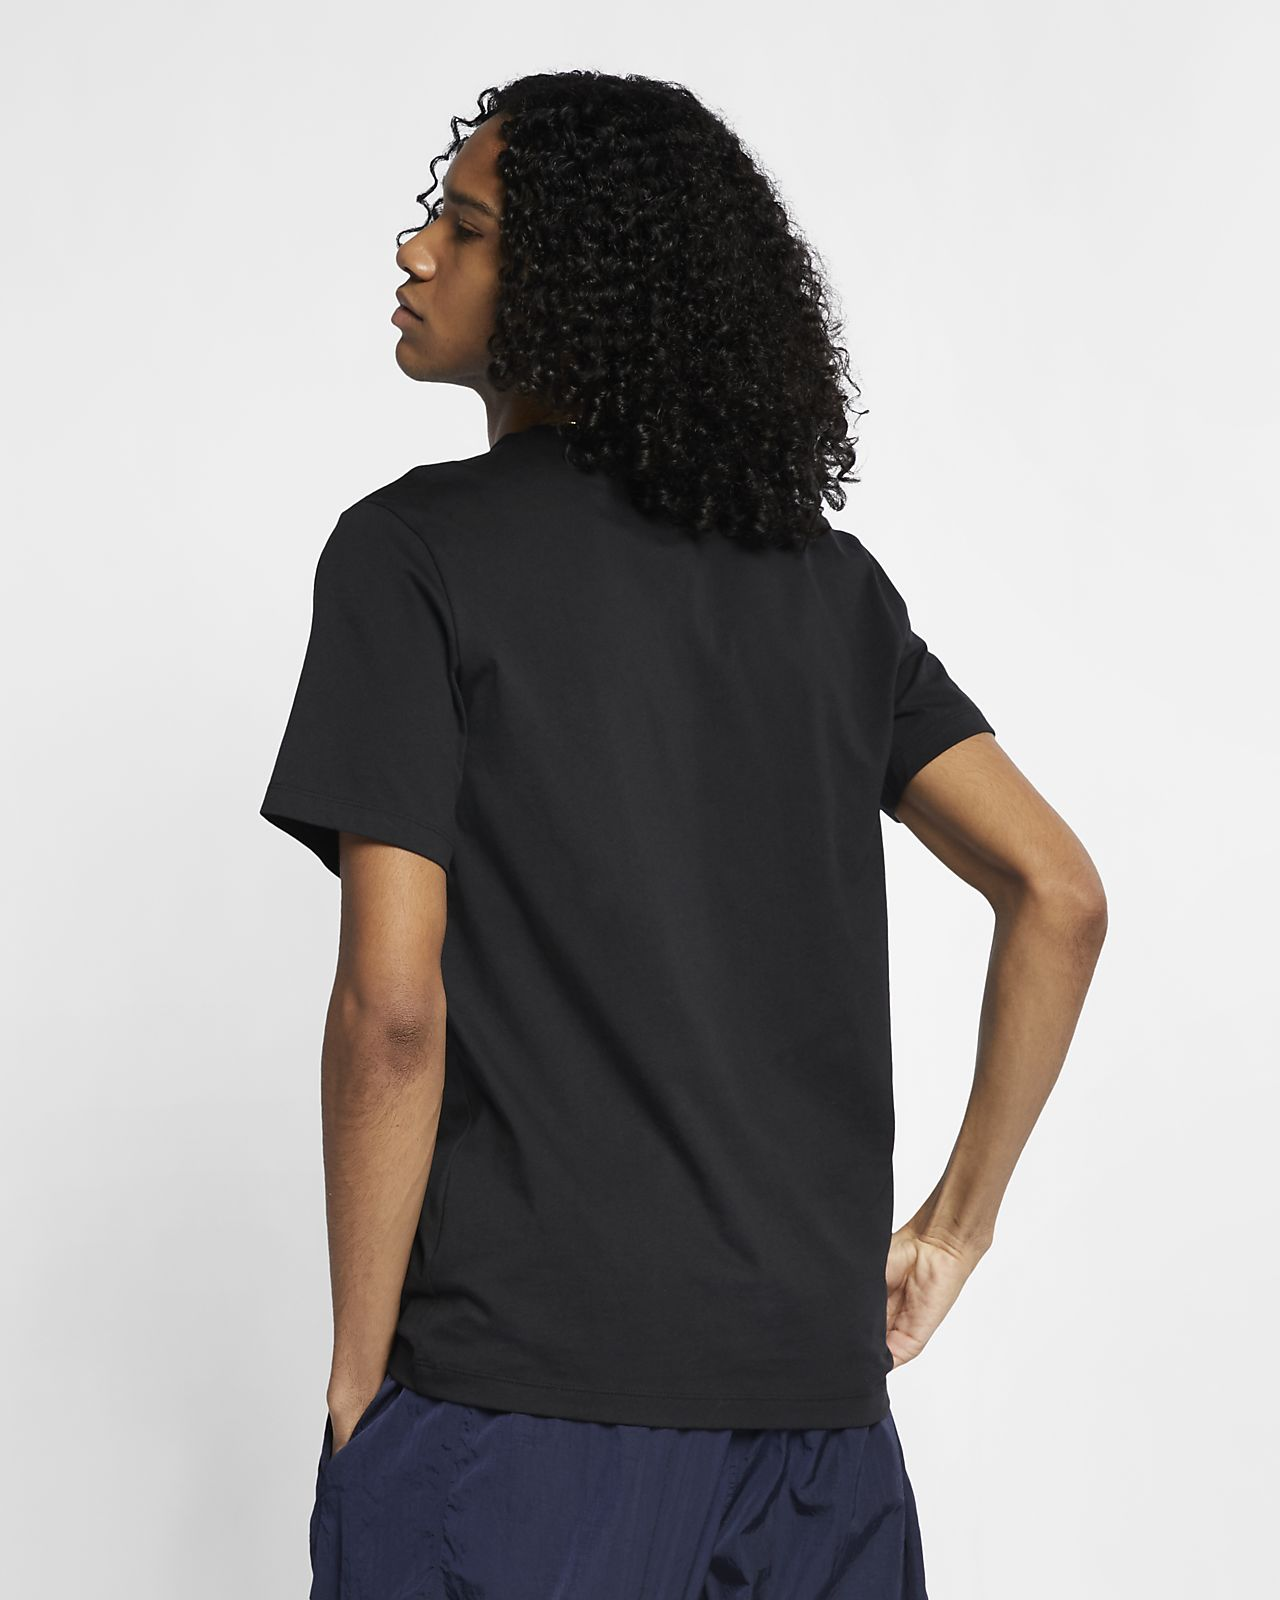 7636c308 Nike Sportswear AF1 Men's T-Shirt. Nike.com